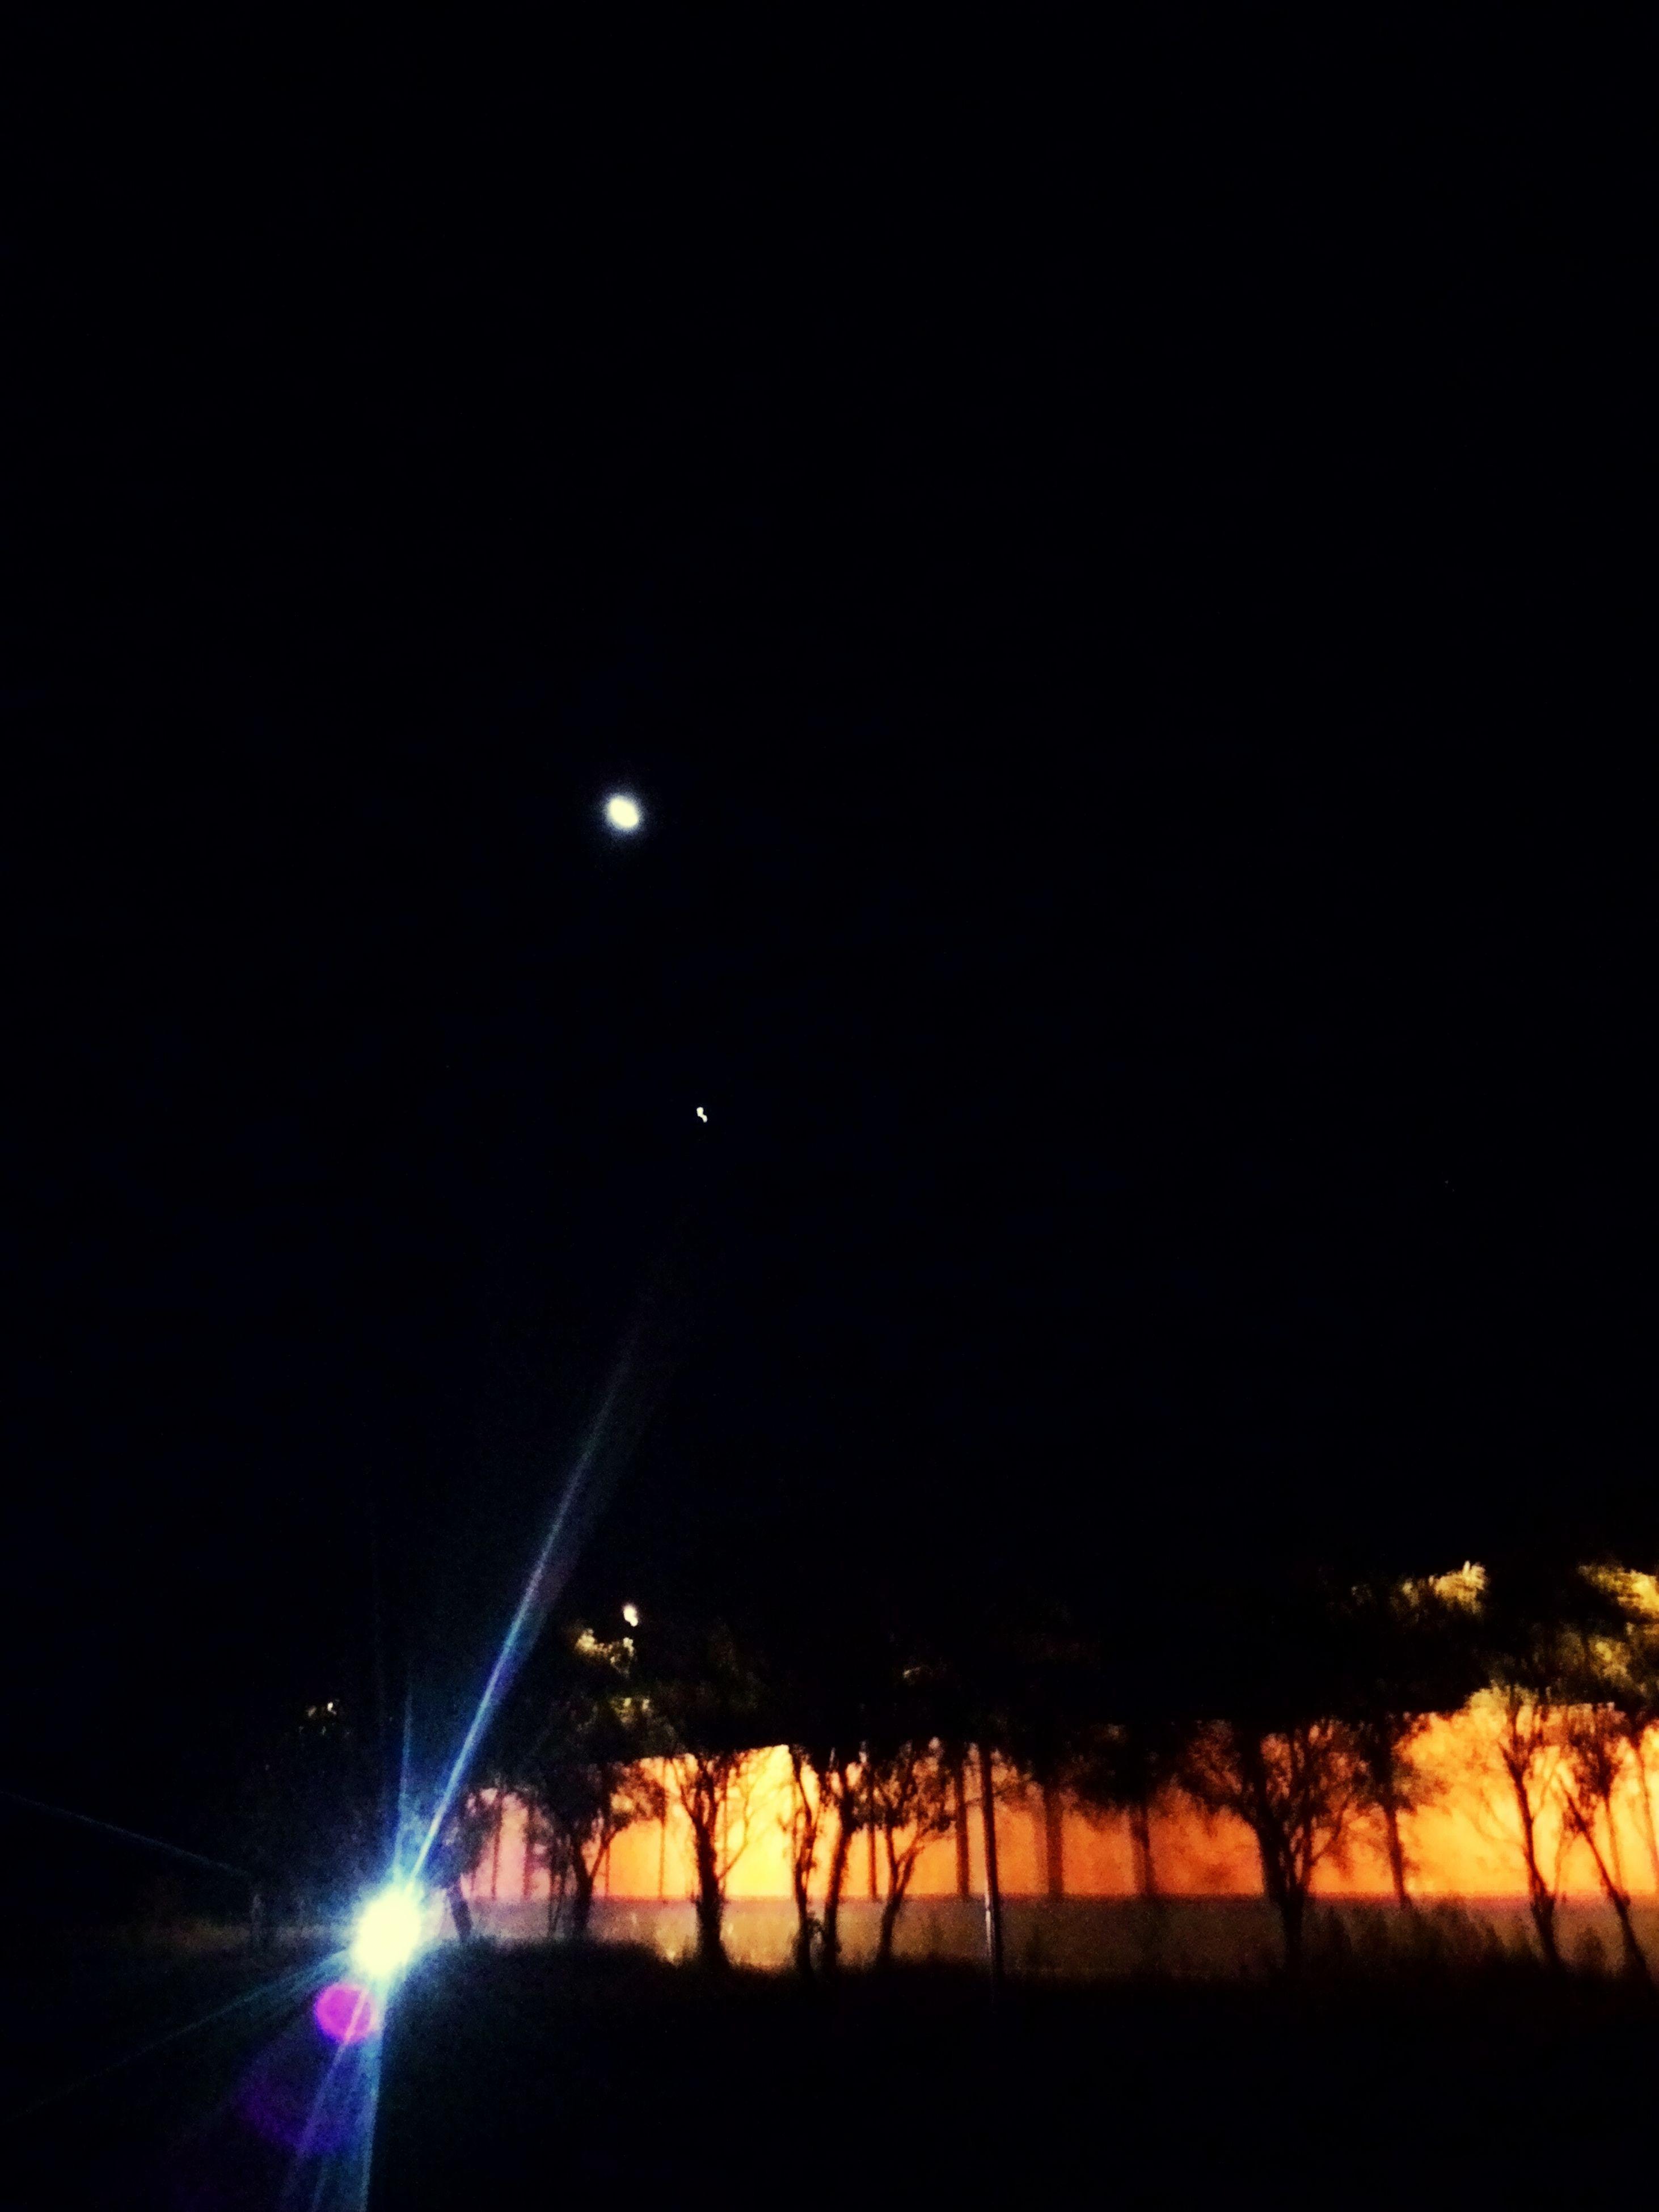 night, illuminated, copy space, dark, silhouette, clear sky, tranquility, moon, tranquil scene, scenics, beauty in nature, nature, street light, sky, glowing, idyllic, lighting equipment, outdoors, tree, light - natural phenomenon